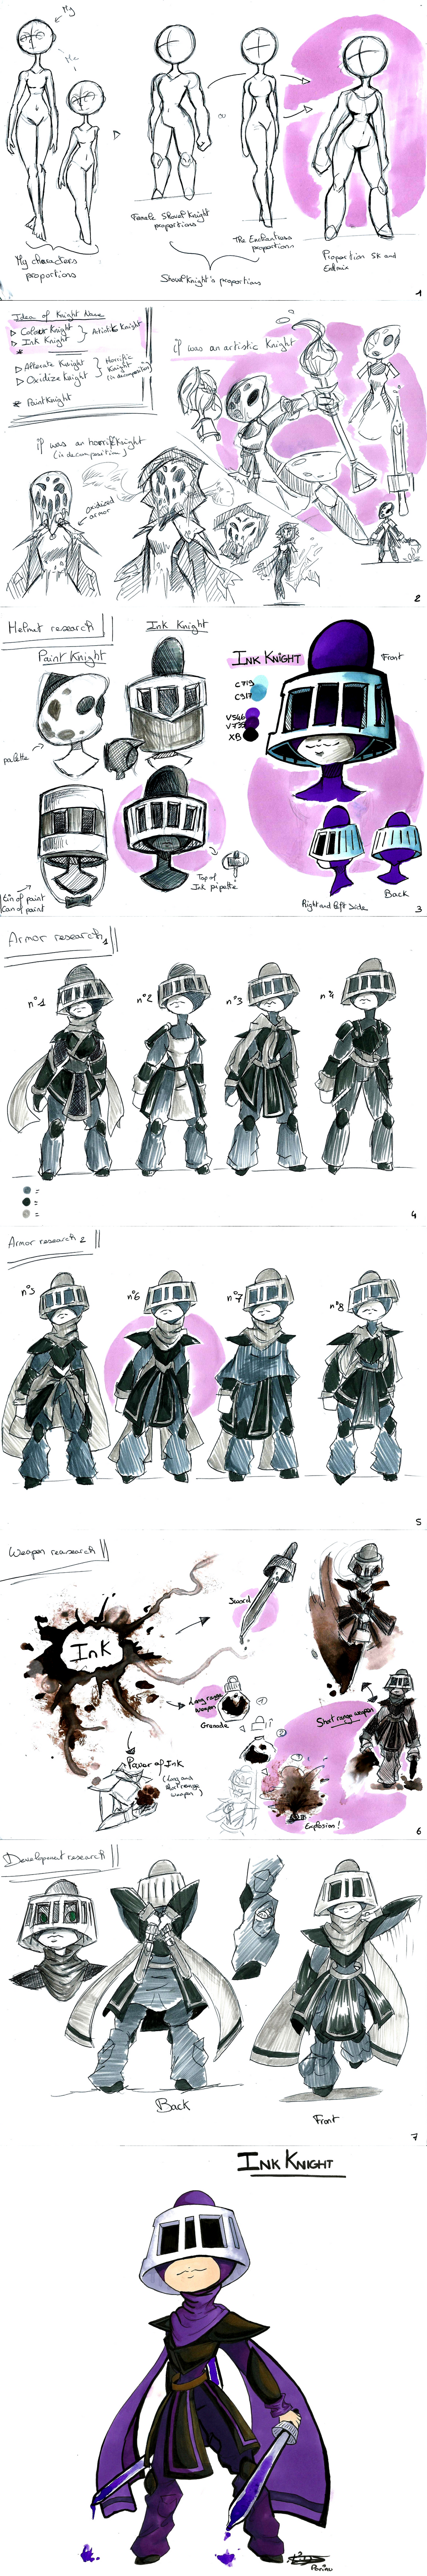 Character design development - Ink Knight